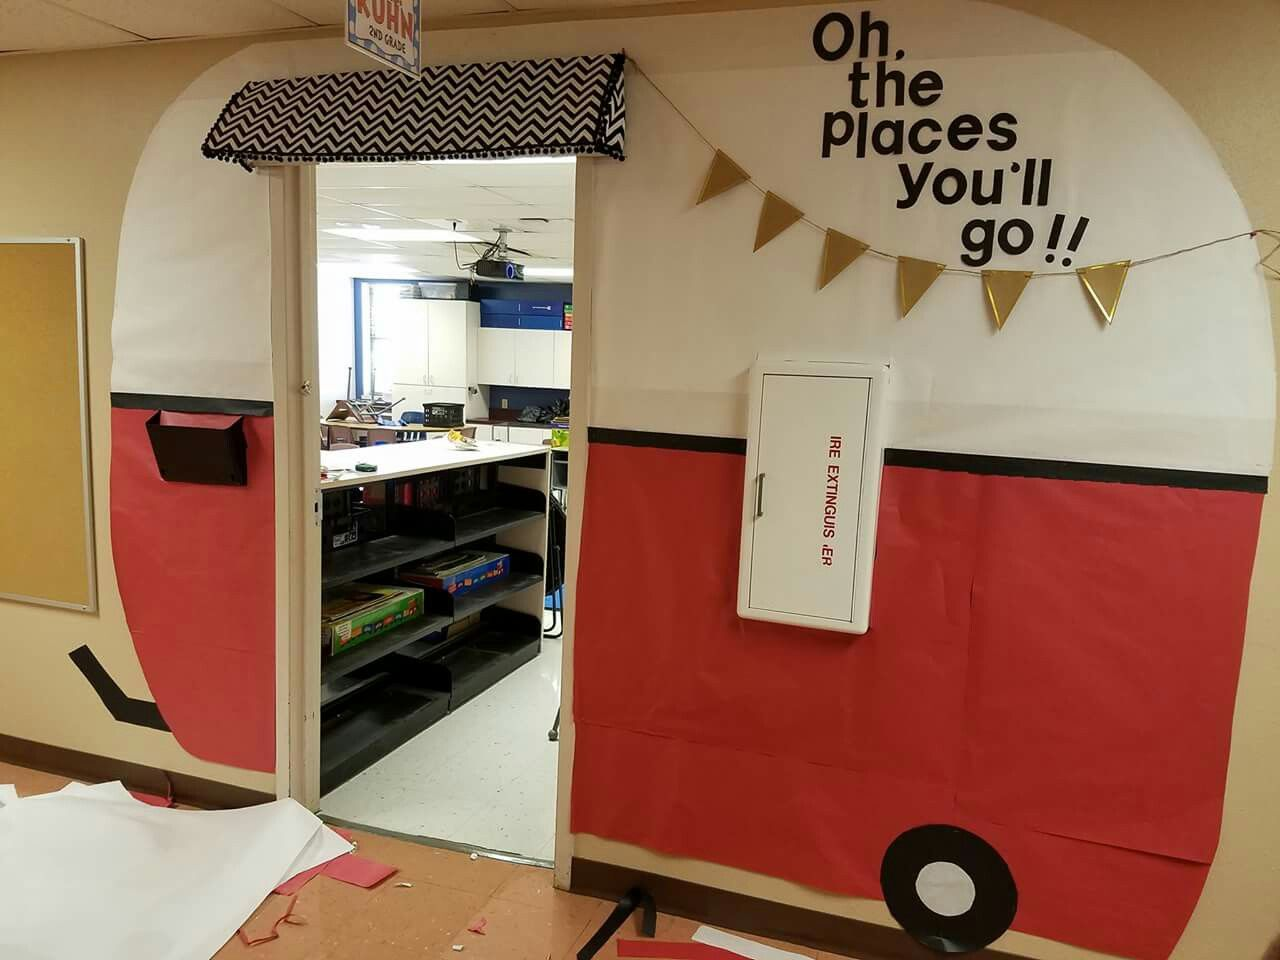 Classroom Bathroom Decor ~ Diy cool cork board ideas instalation photos